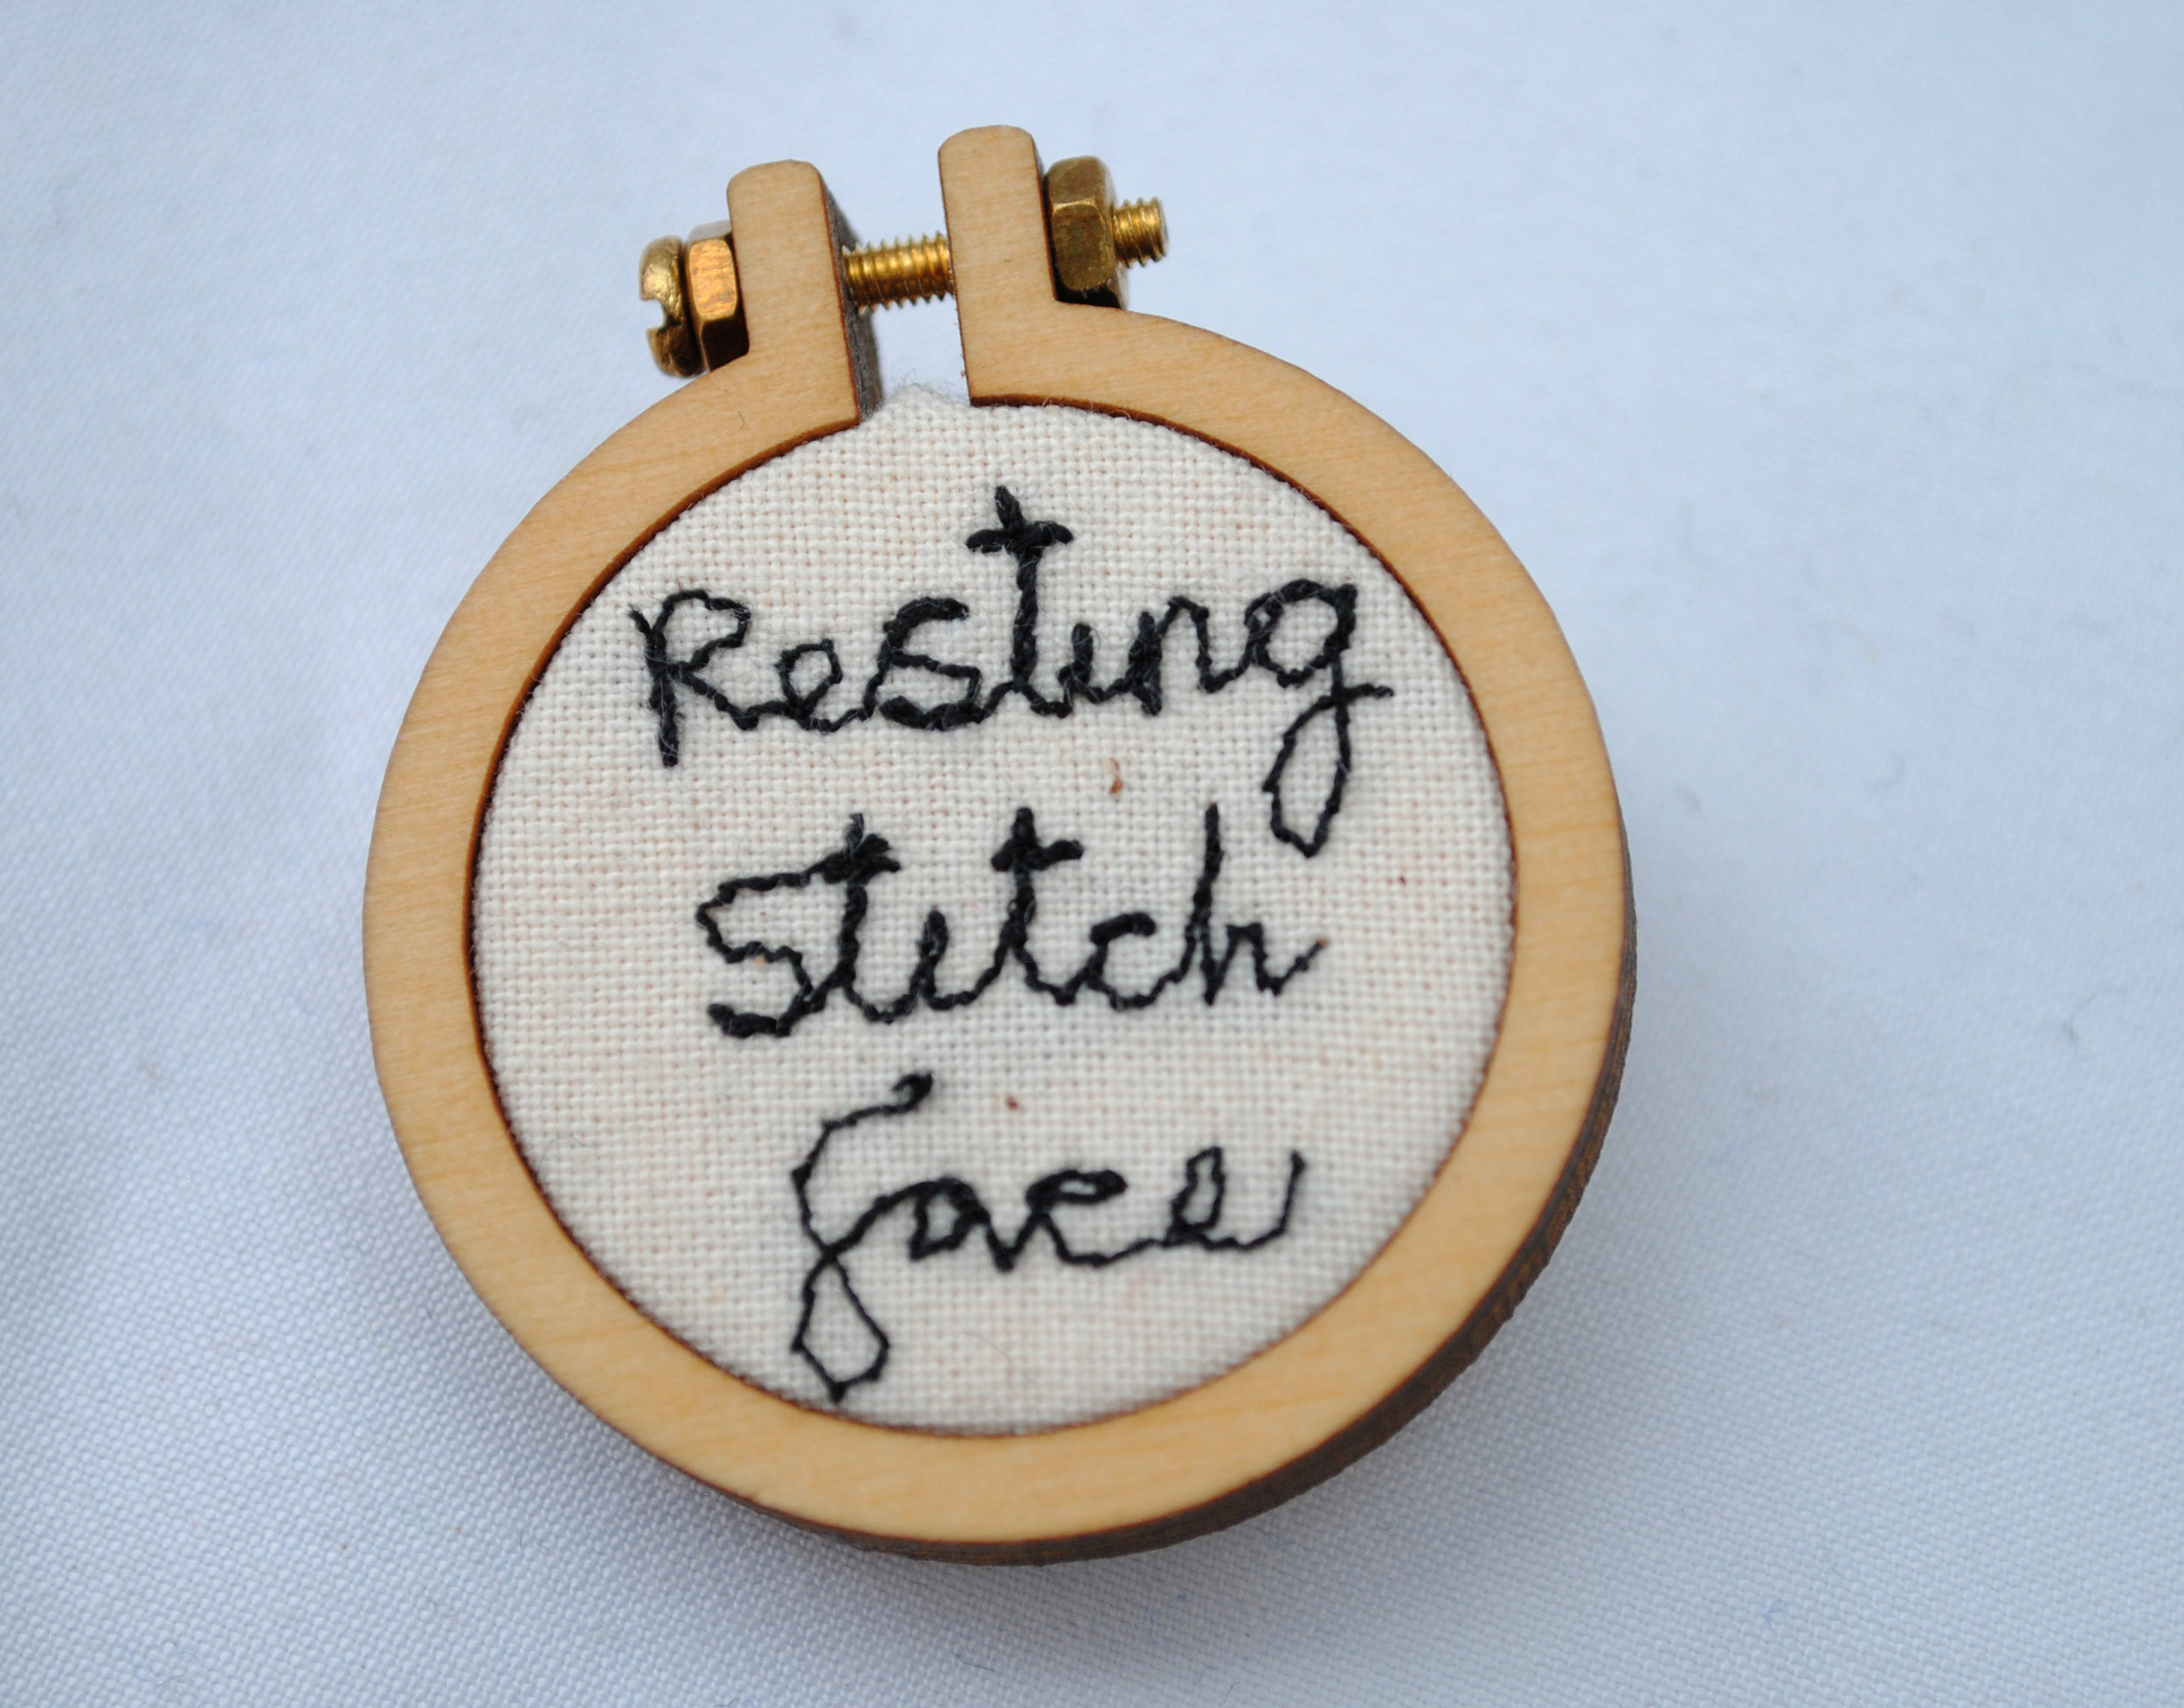 Resting stich face.jpg